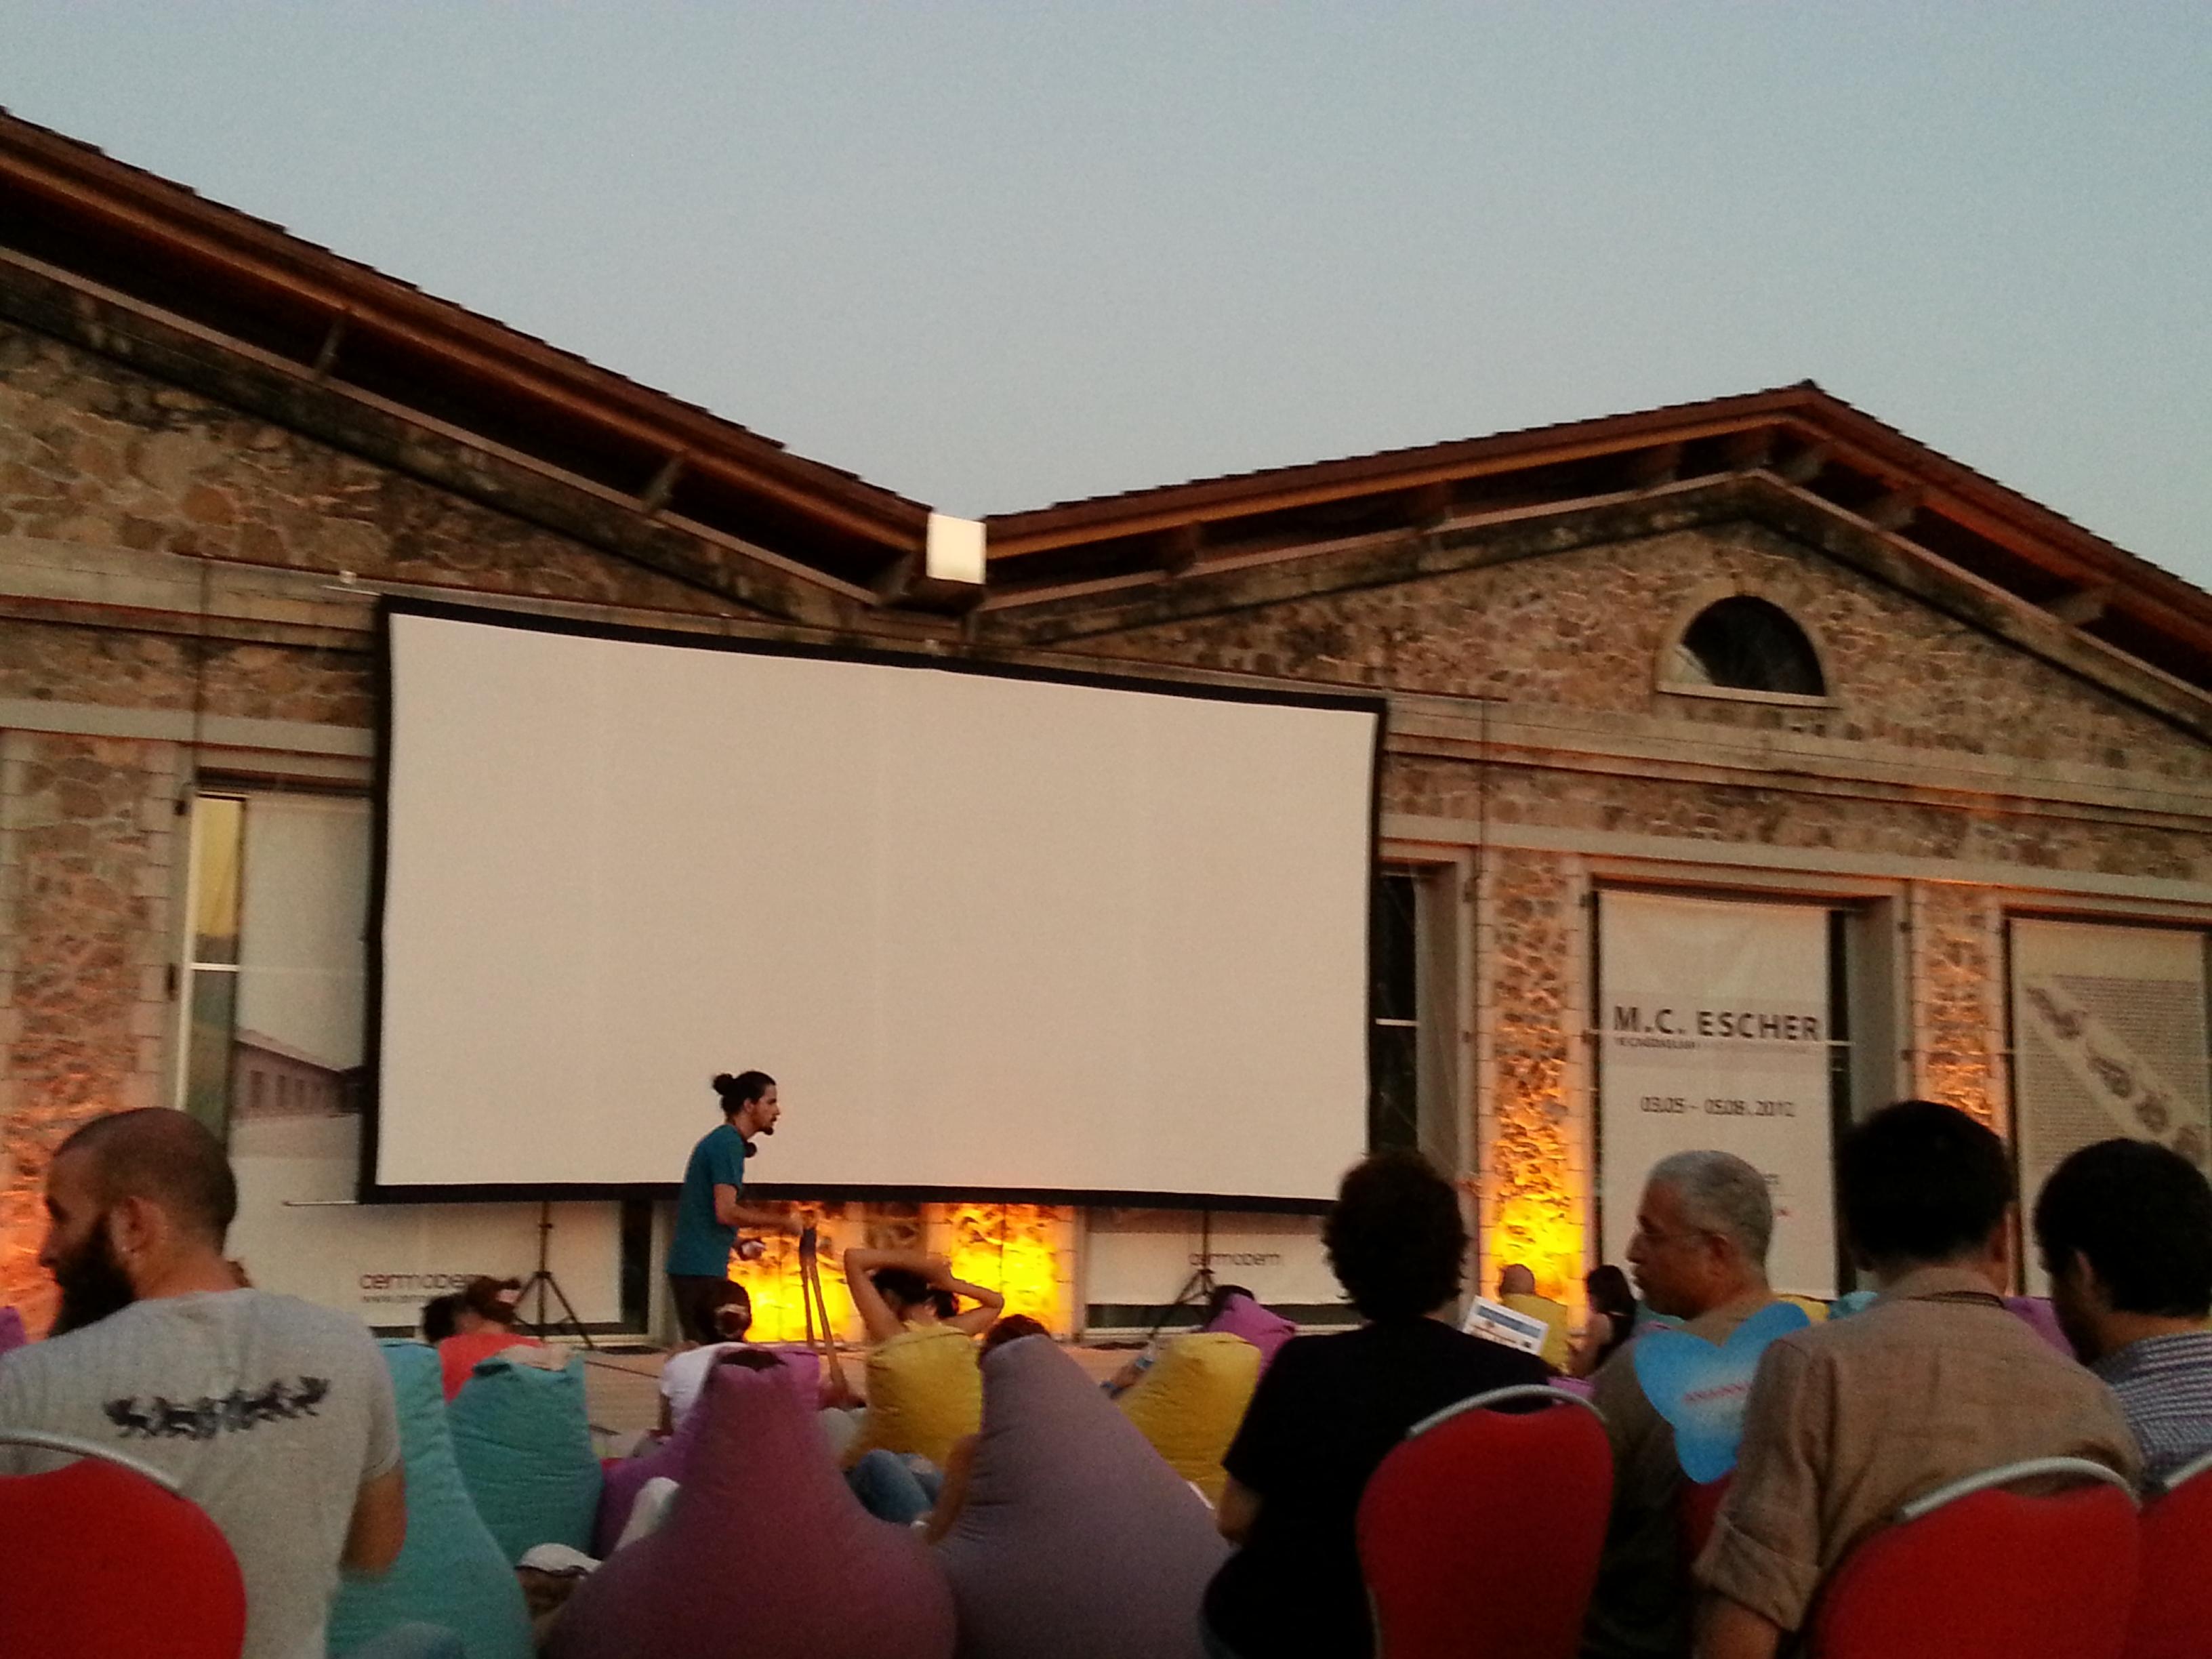 open air cinema � hot fun in the summertime adventures